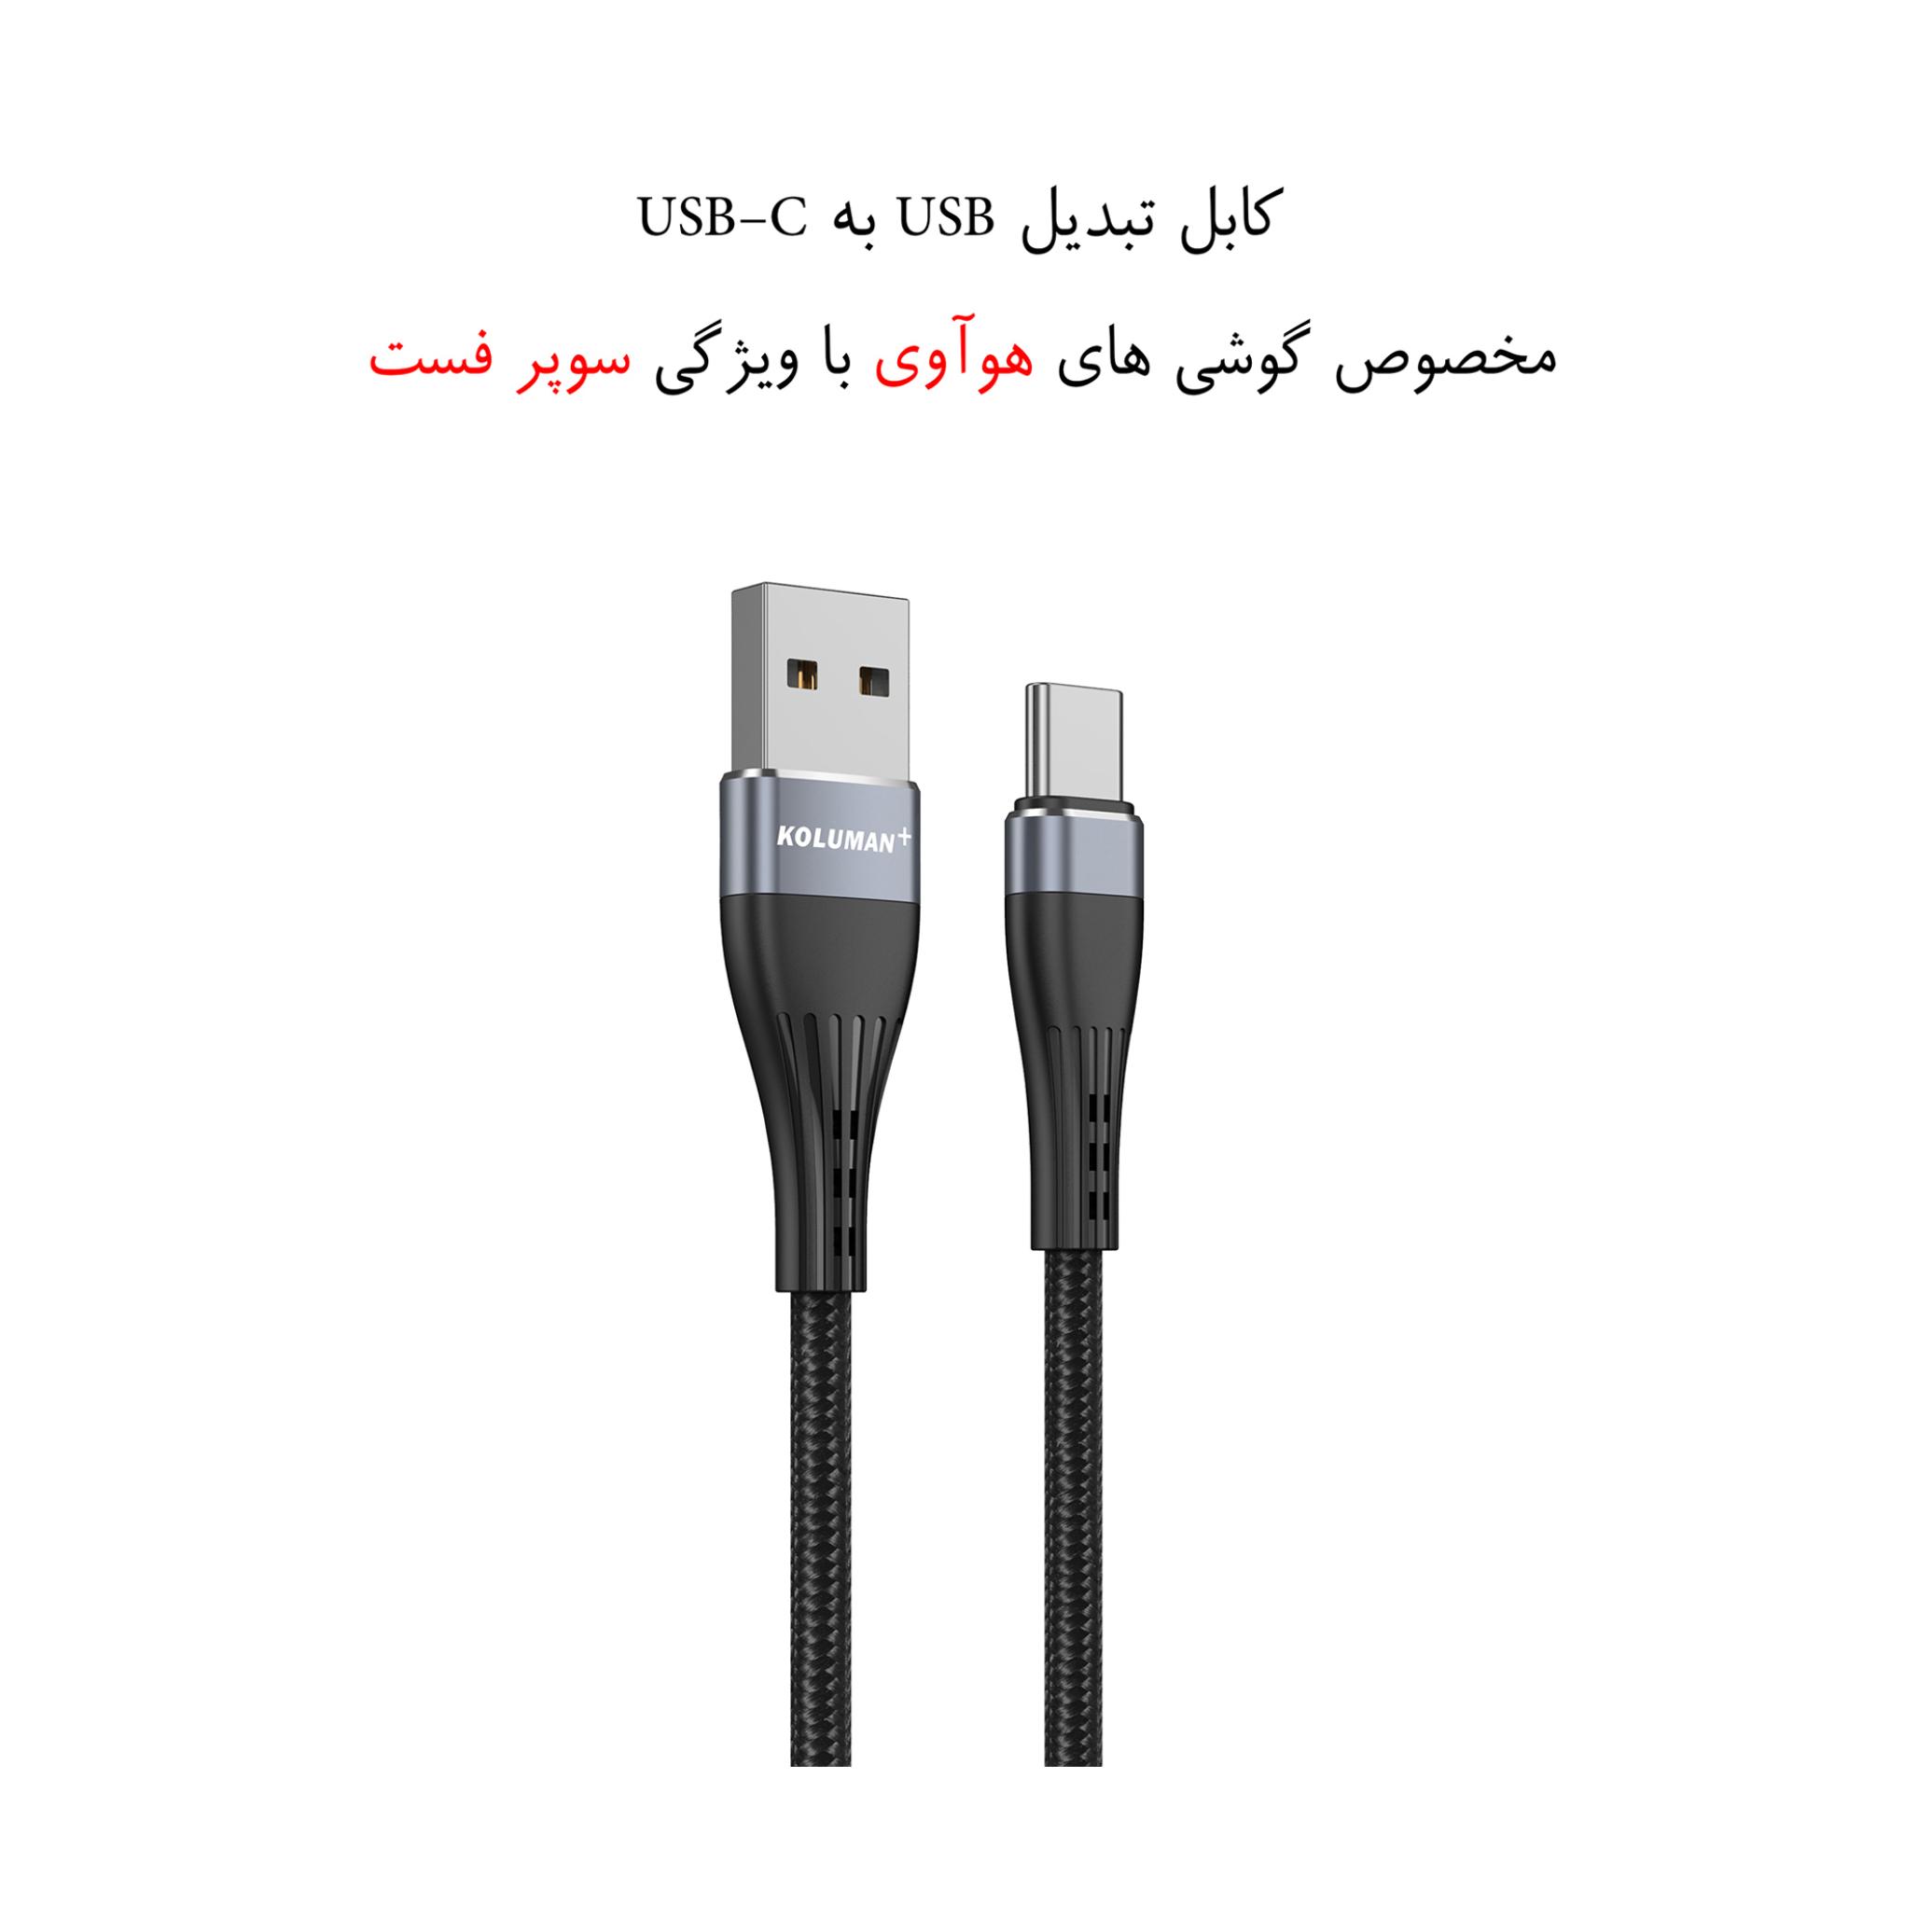 کابل تبدیل USB به USB-C کلومن پلاس